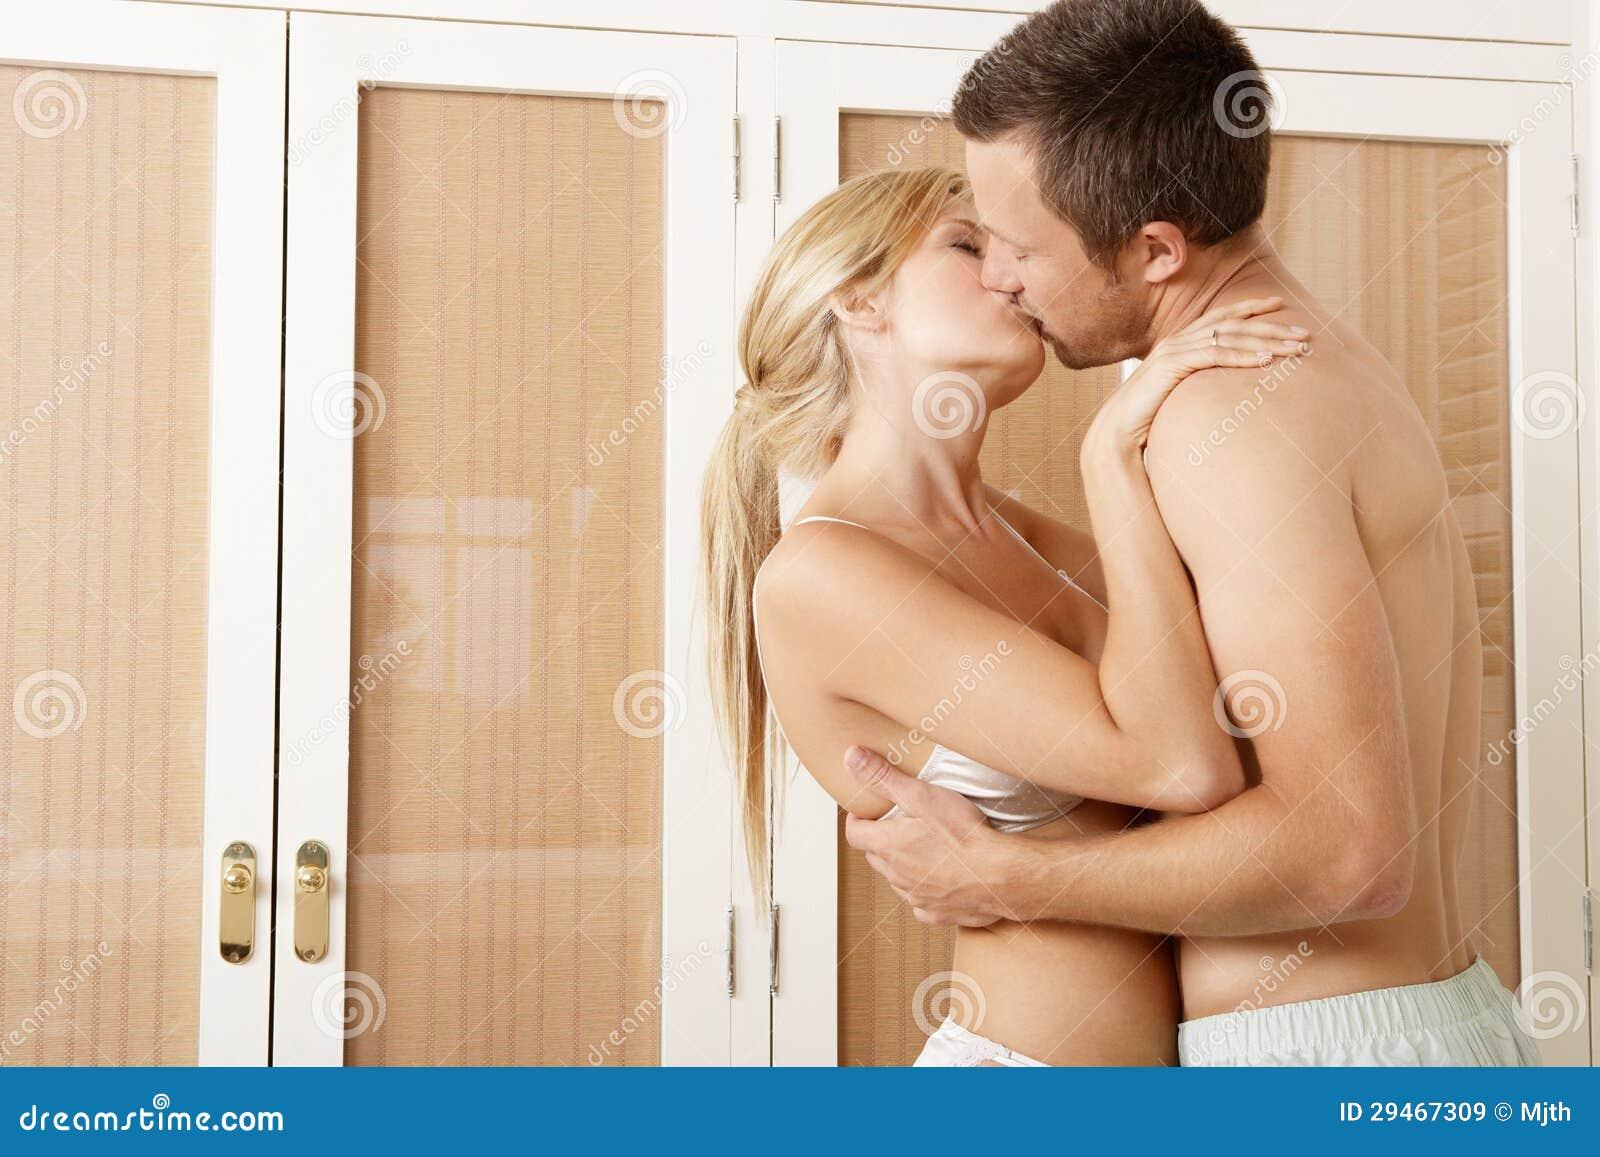 nude hot bedroom couple